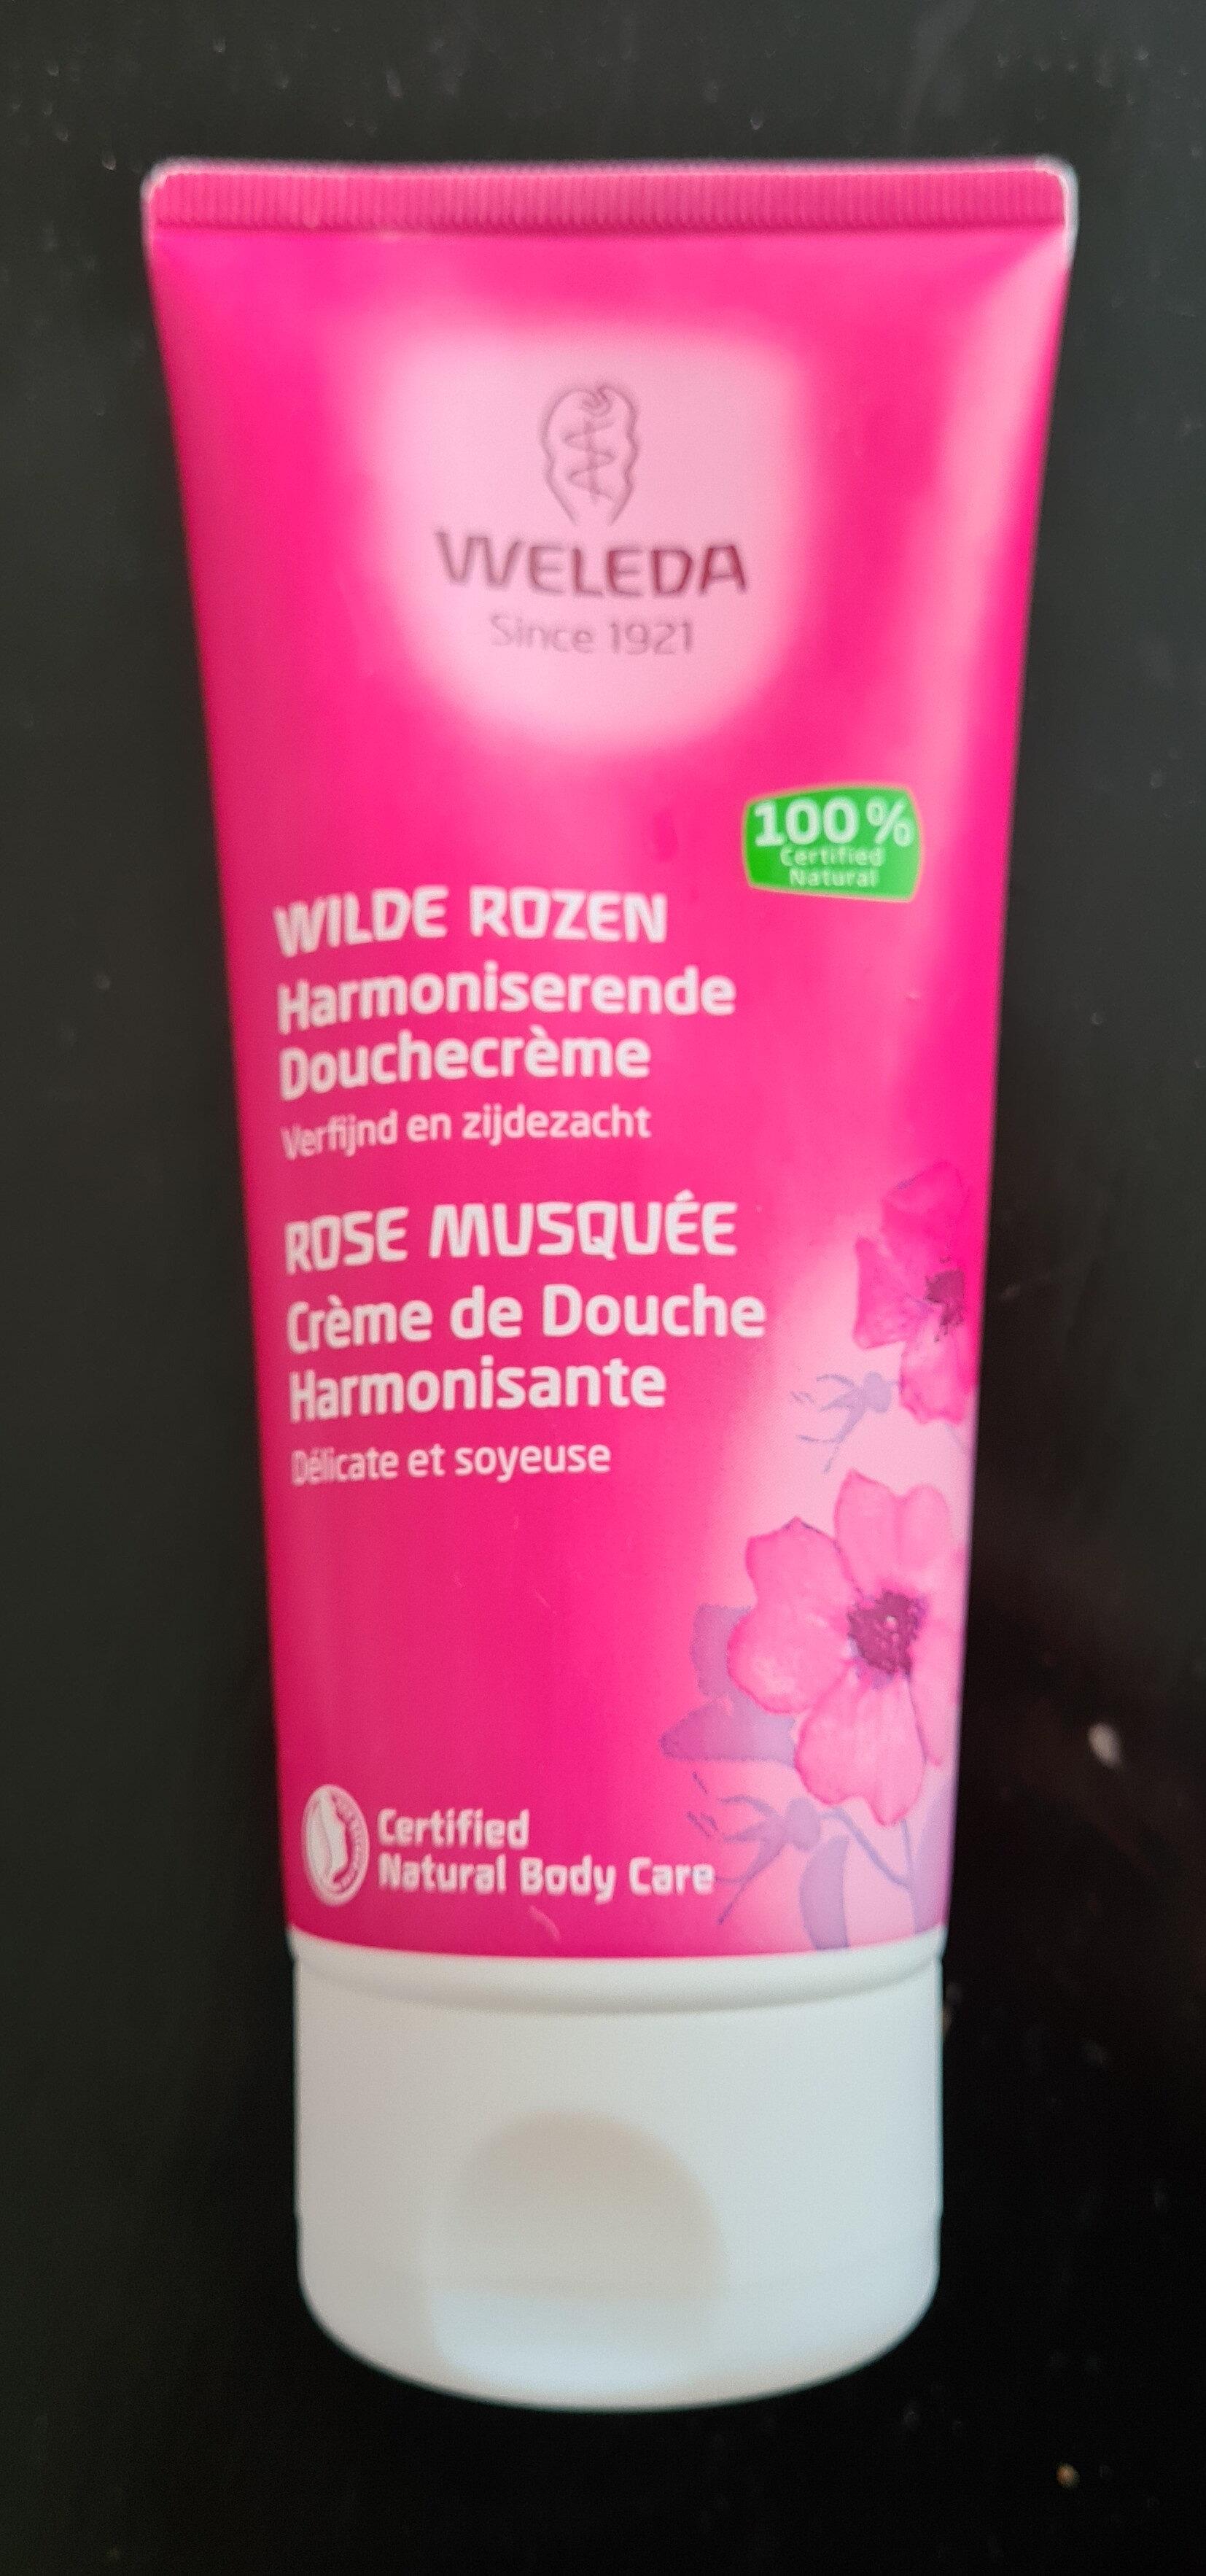 Welada wild rose shower cream - Product - fr